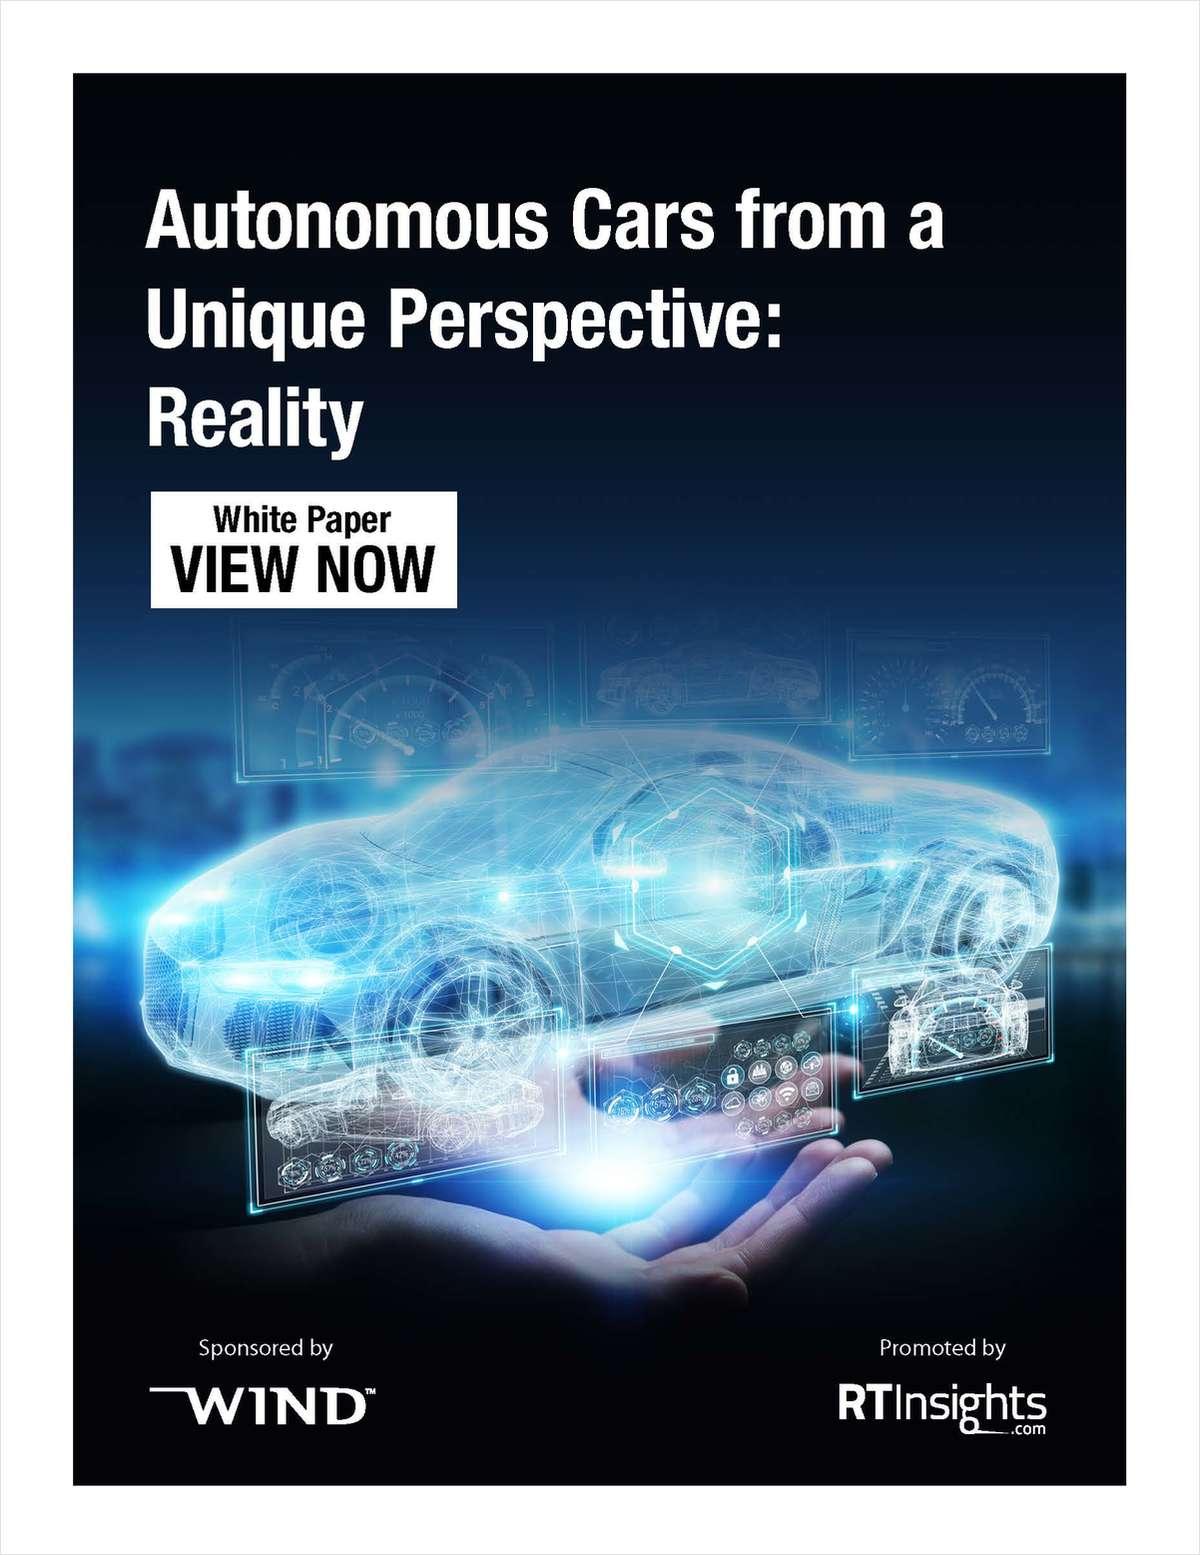 Autonomous Cars from a Unique Perspective: Reality